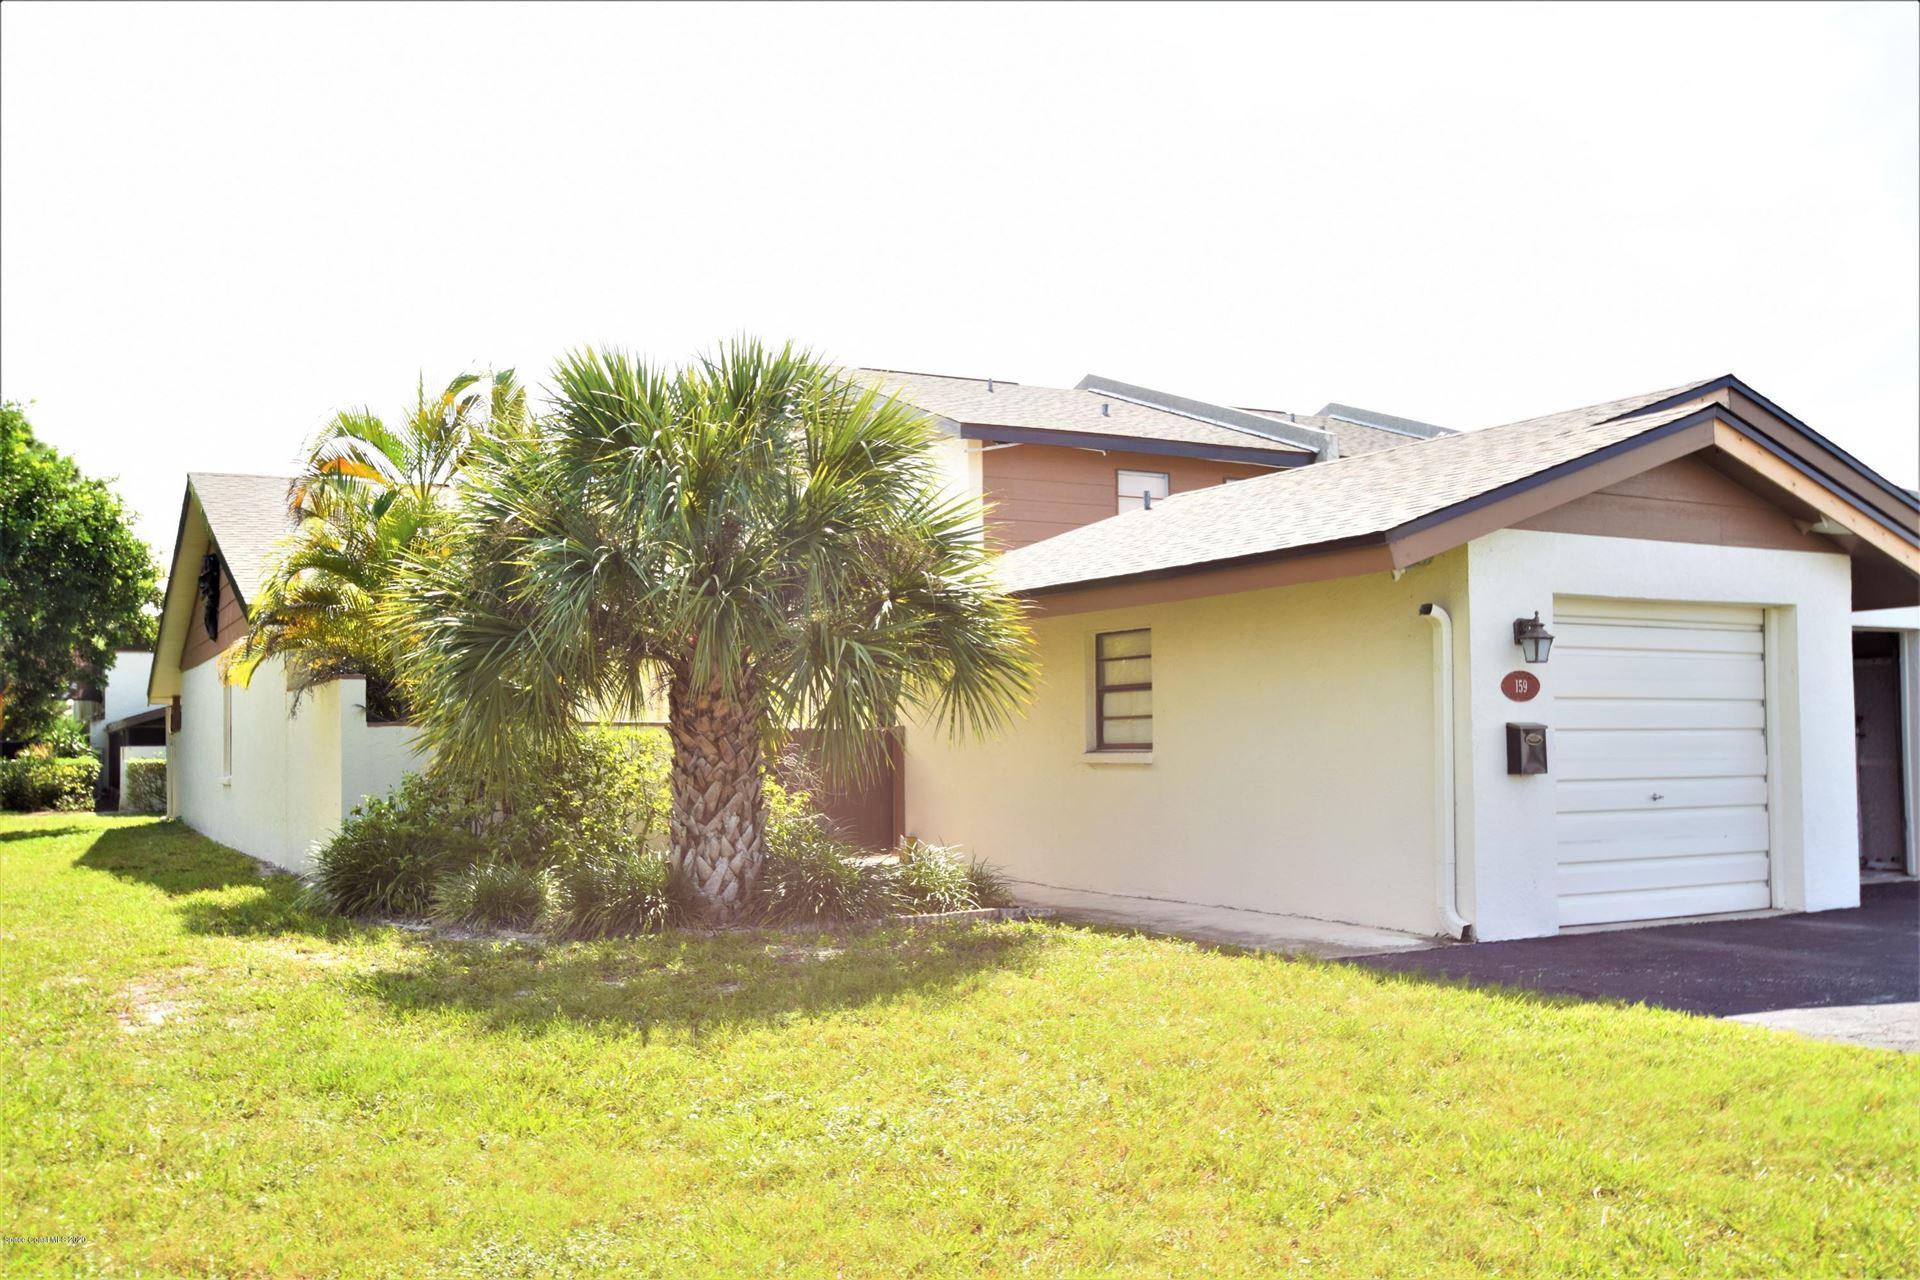 159 Kristi Drive, Indian Harbour Beach, FL 32937 - #: 888042